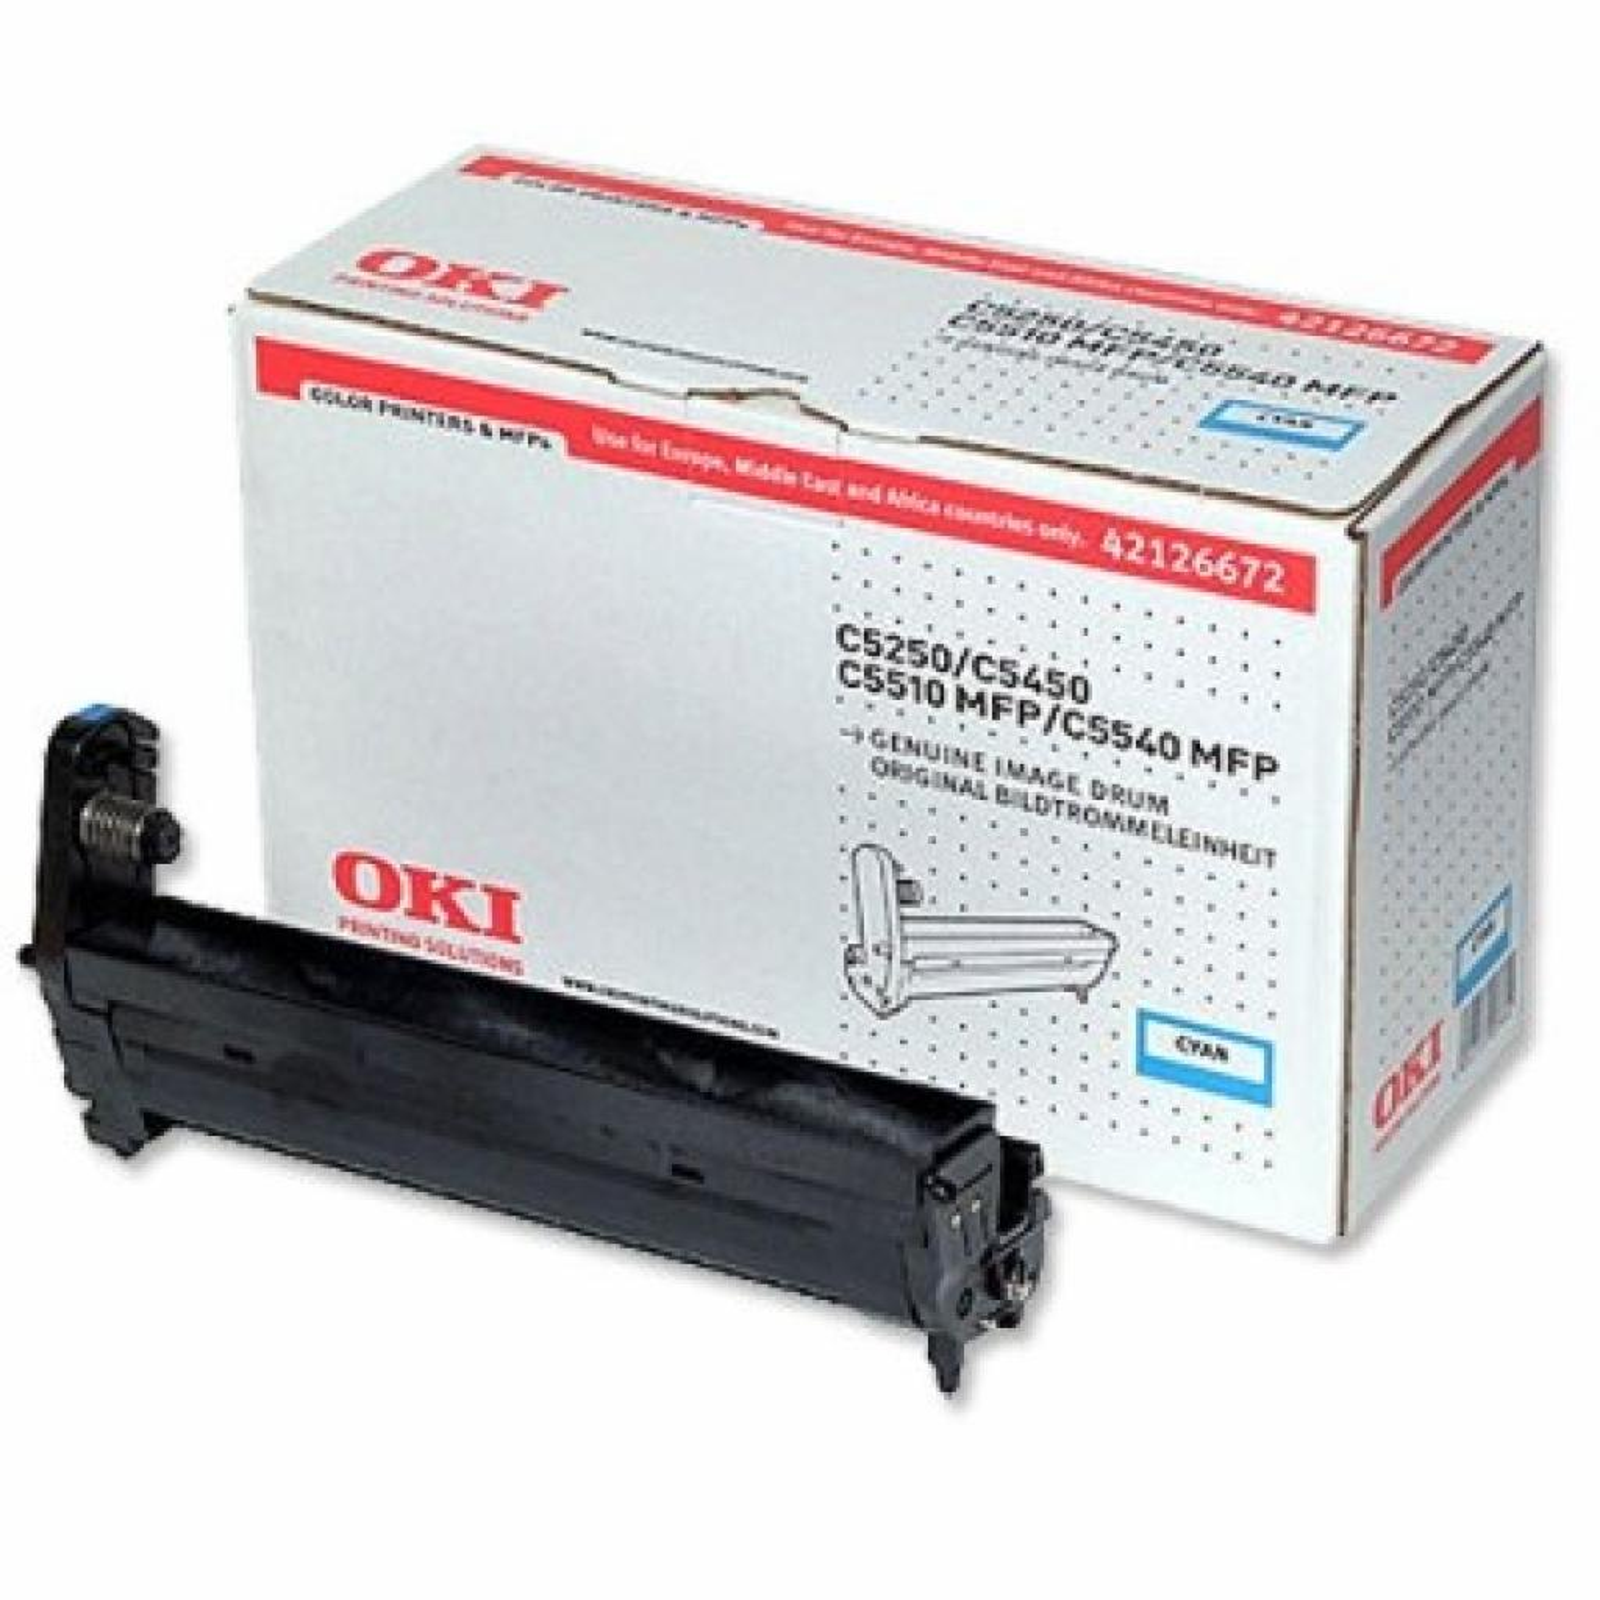 Фотокондуктор OKI C5250/5450/5510MFP/5540MFP Cyan (42126672)